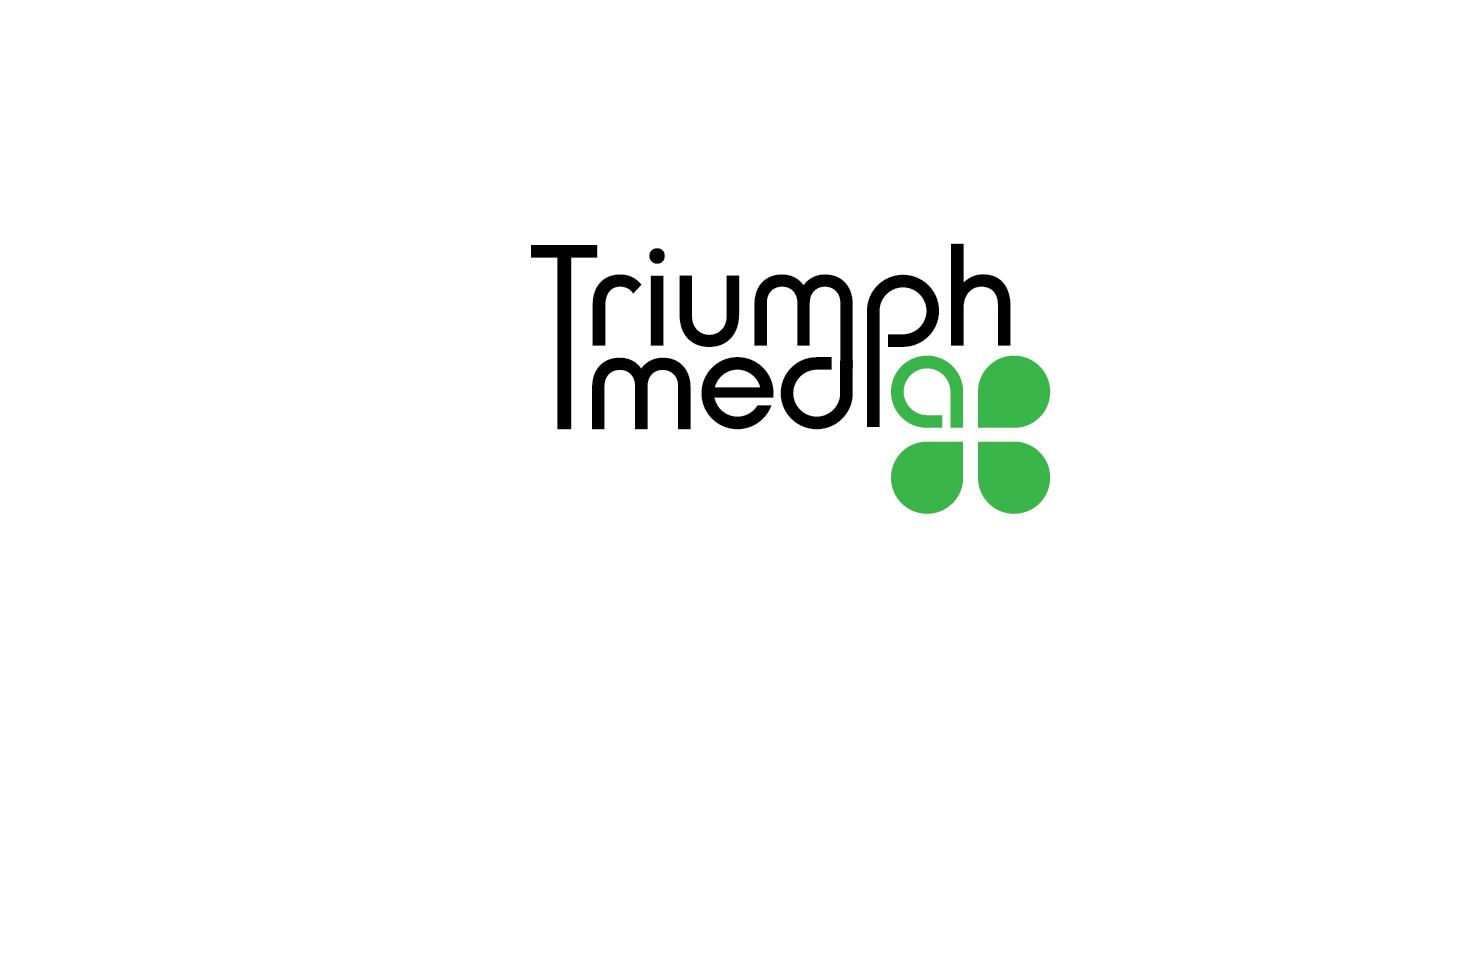 Разработка логотипа  TRIUMPH MEDIA с изображением клевера фото f_507293ec928c0.jpg